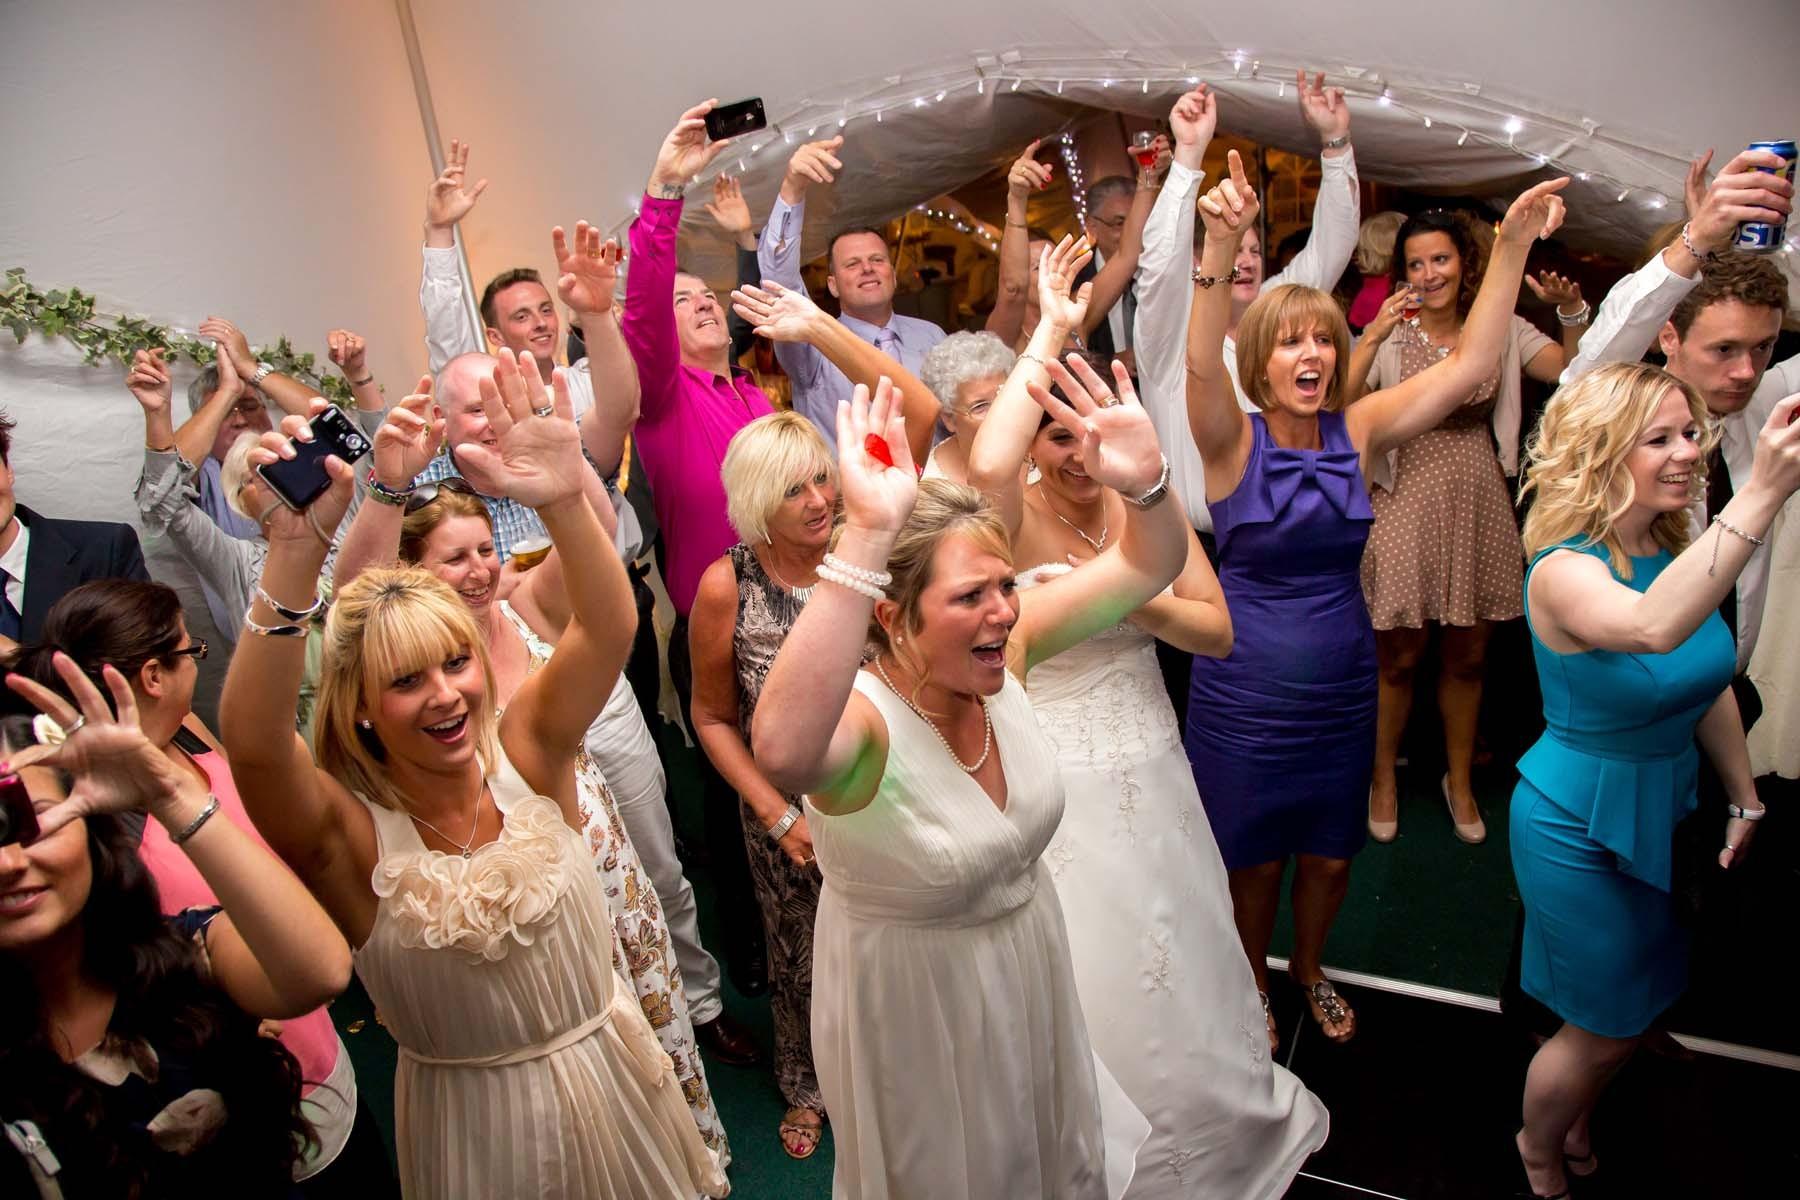 Sussex & Surrey Wedding Photographer - Guests & Groups (28)